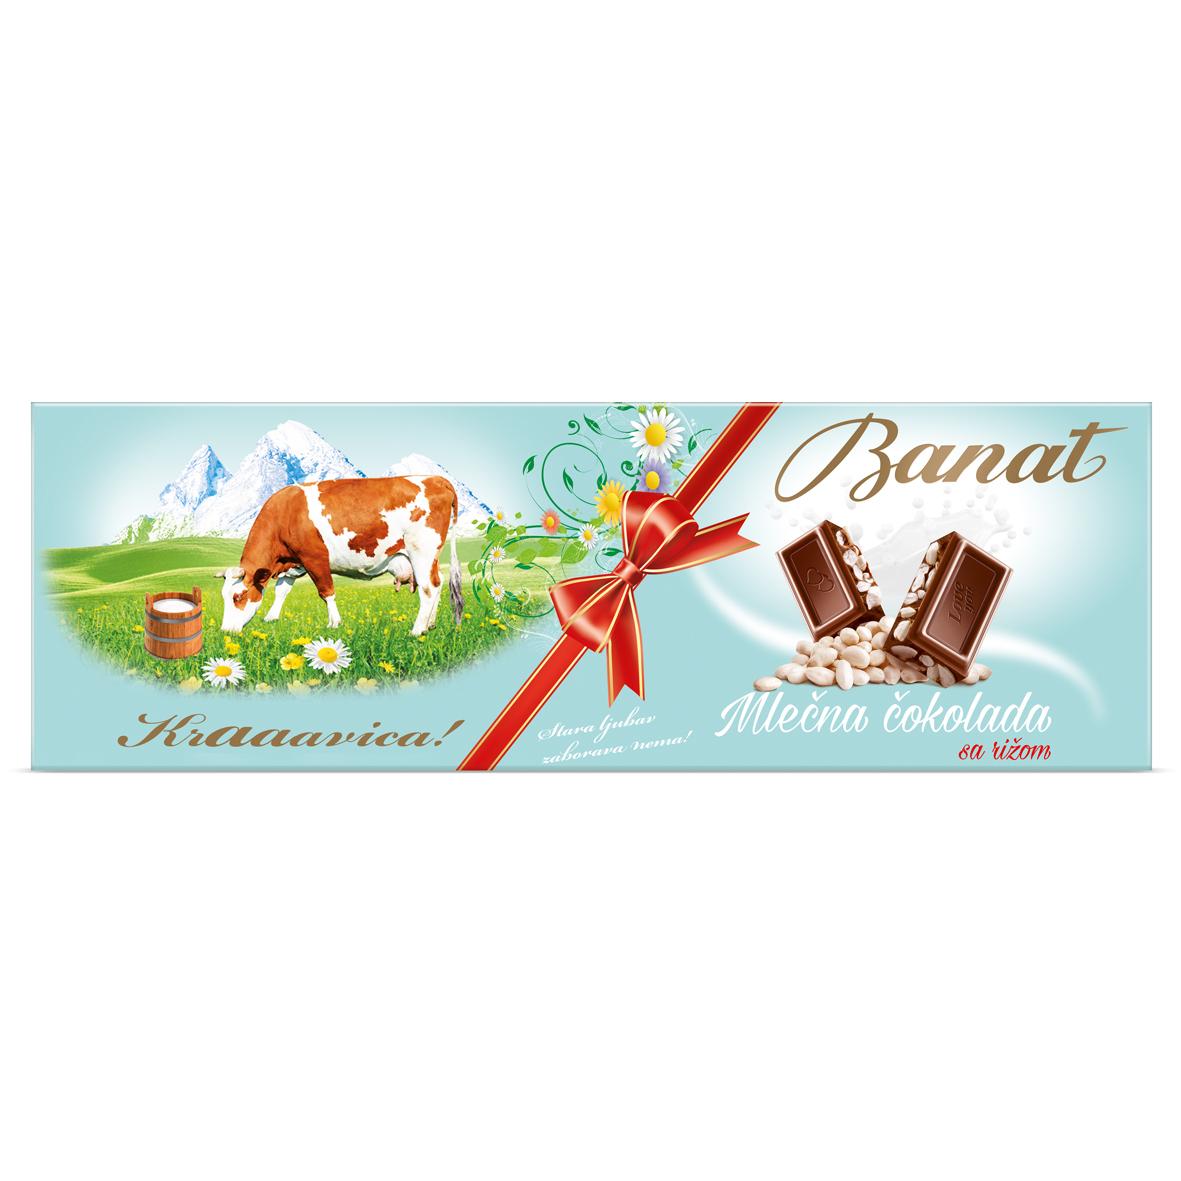 Banat cokolada riza